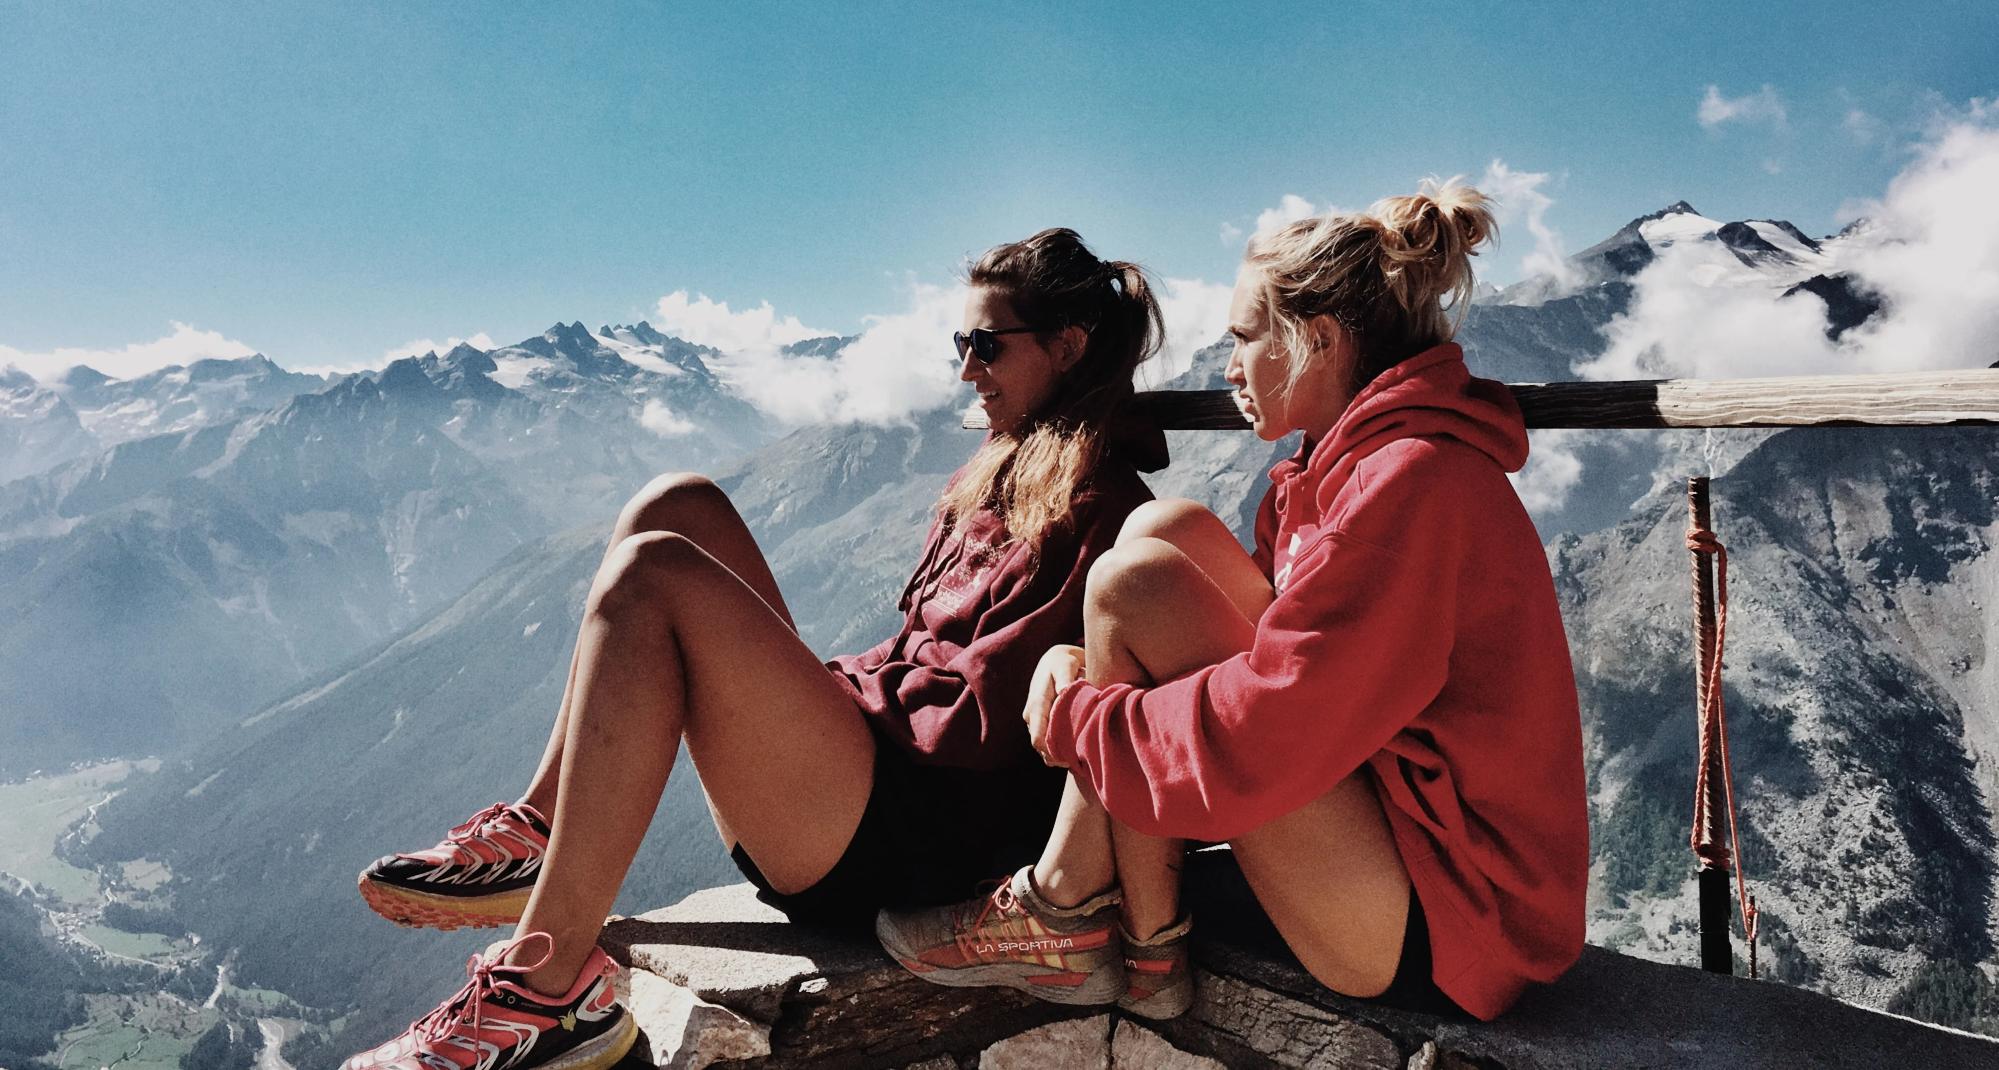 women-on-mountain-crop